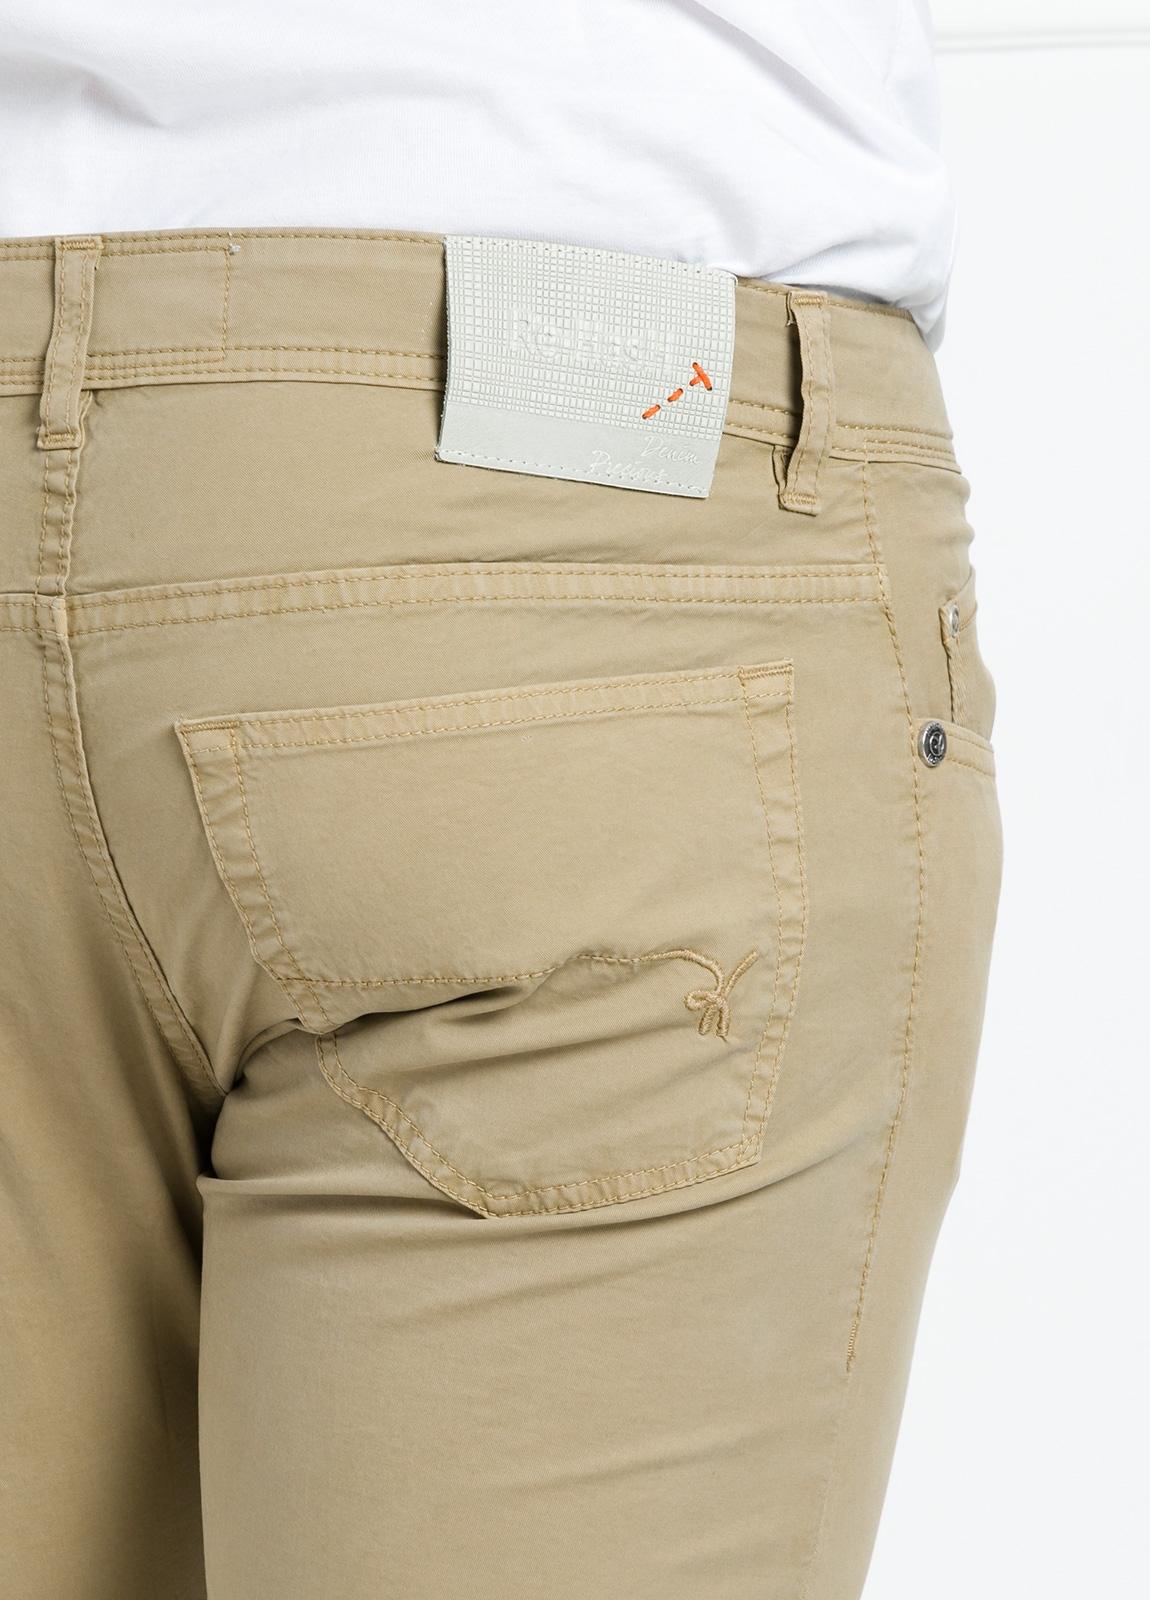 Pantalón sport regular fit modelo POLLOCK P 053 color beige. 96% Algodón gabardina 4% Lycra. - Ítem2